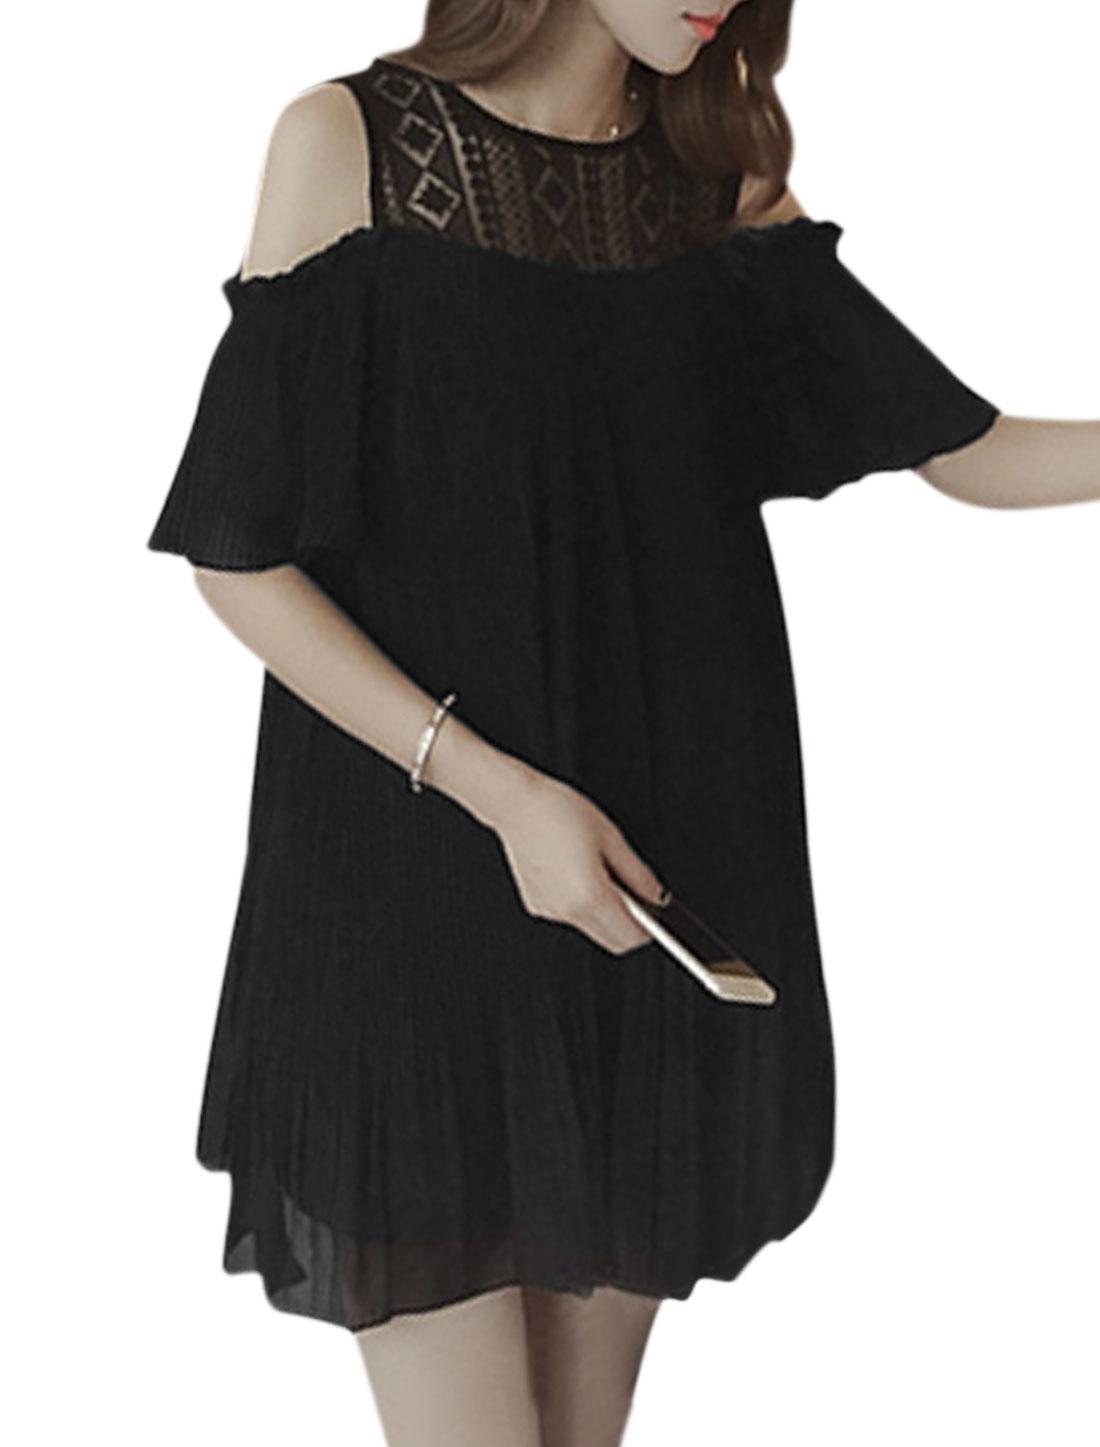 Lady Lace Panel Cold Shoulder Round Neck Chiffon Pleated Dress Black XS